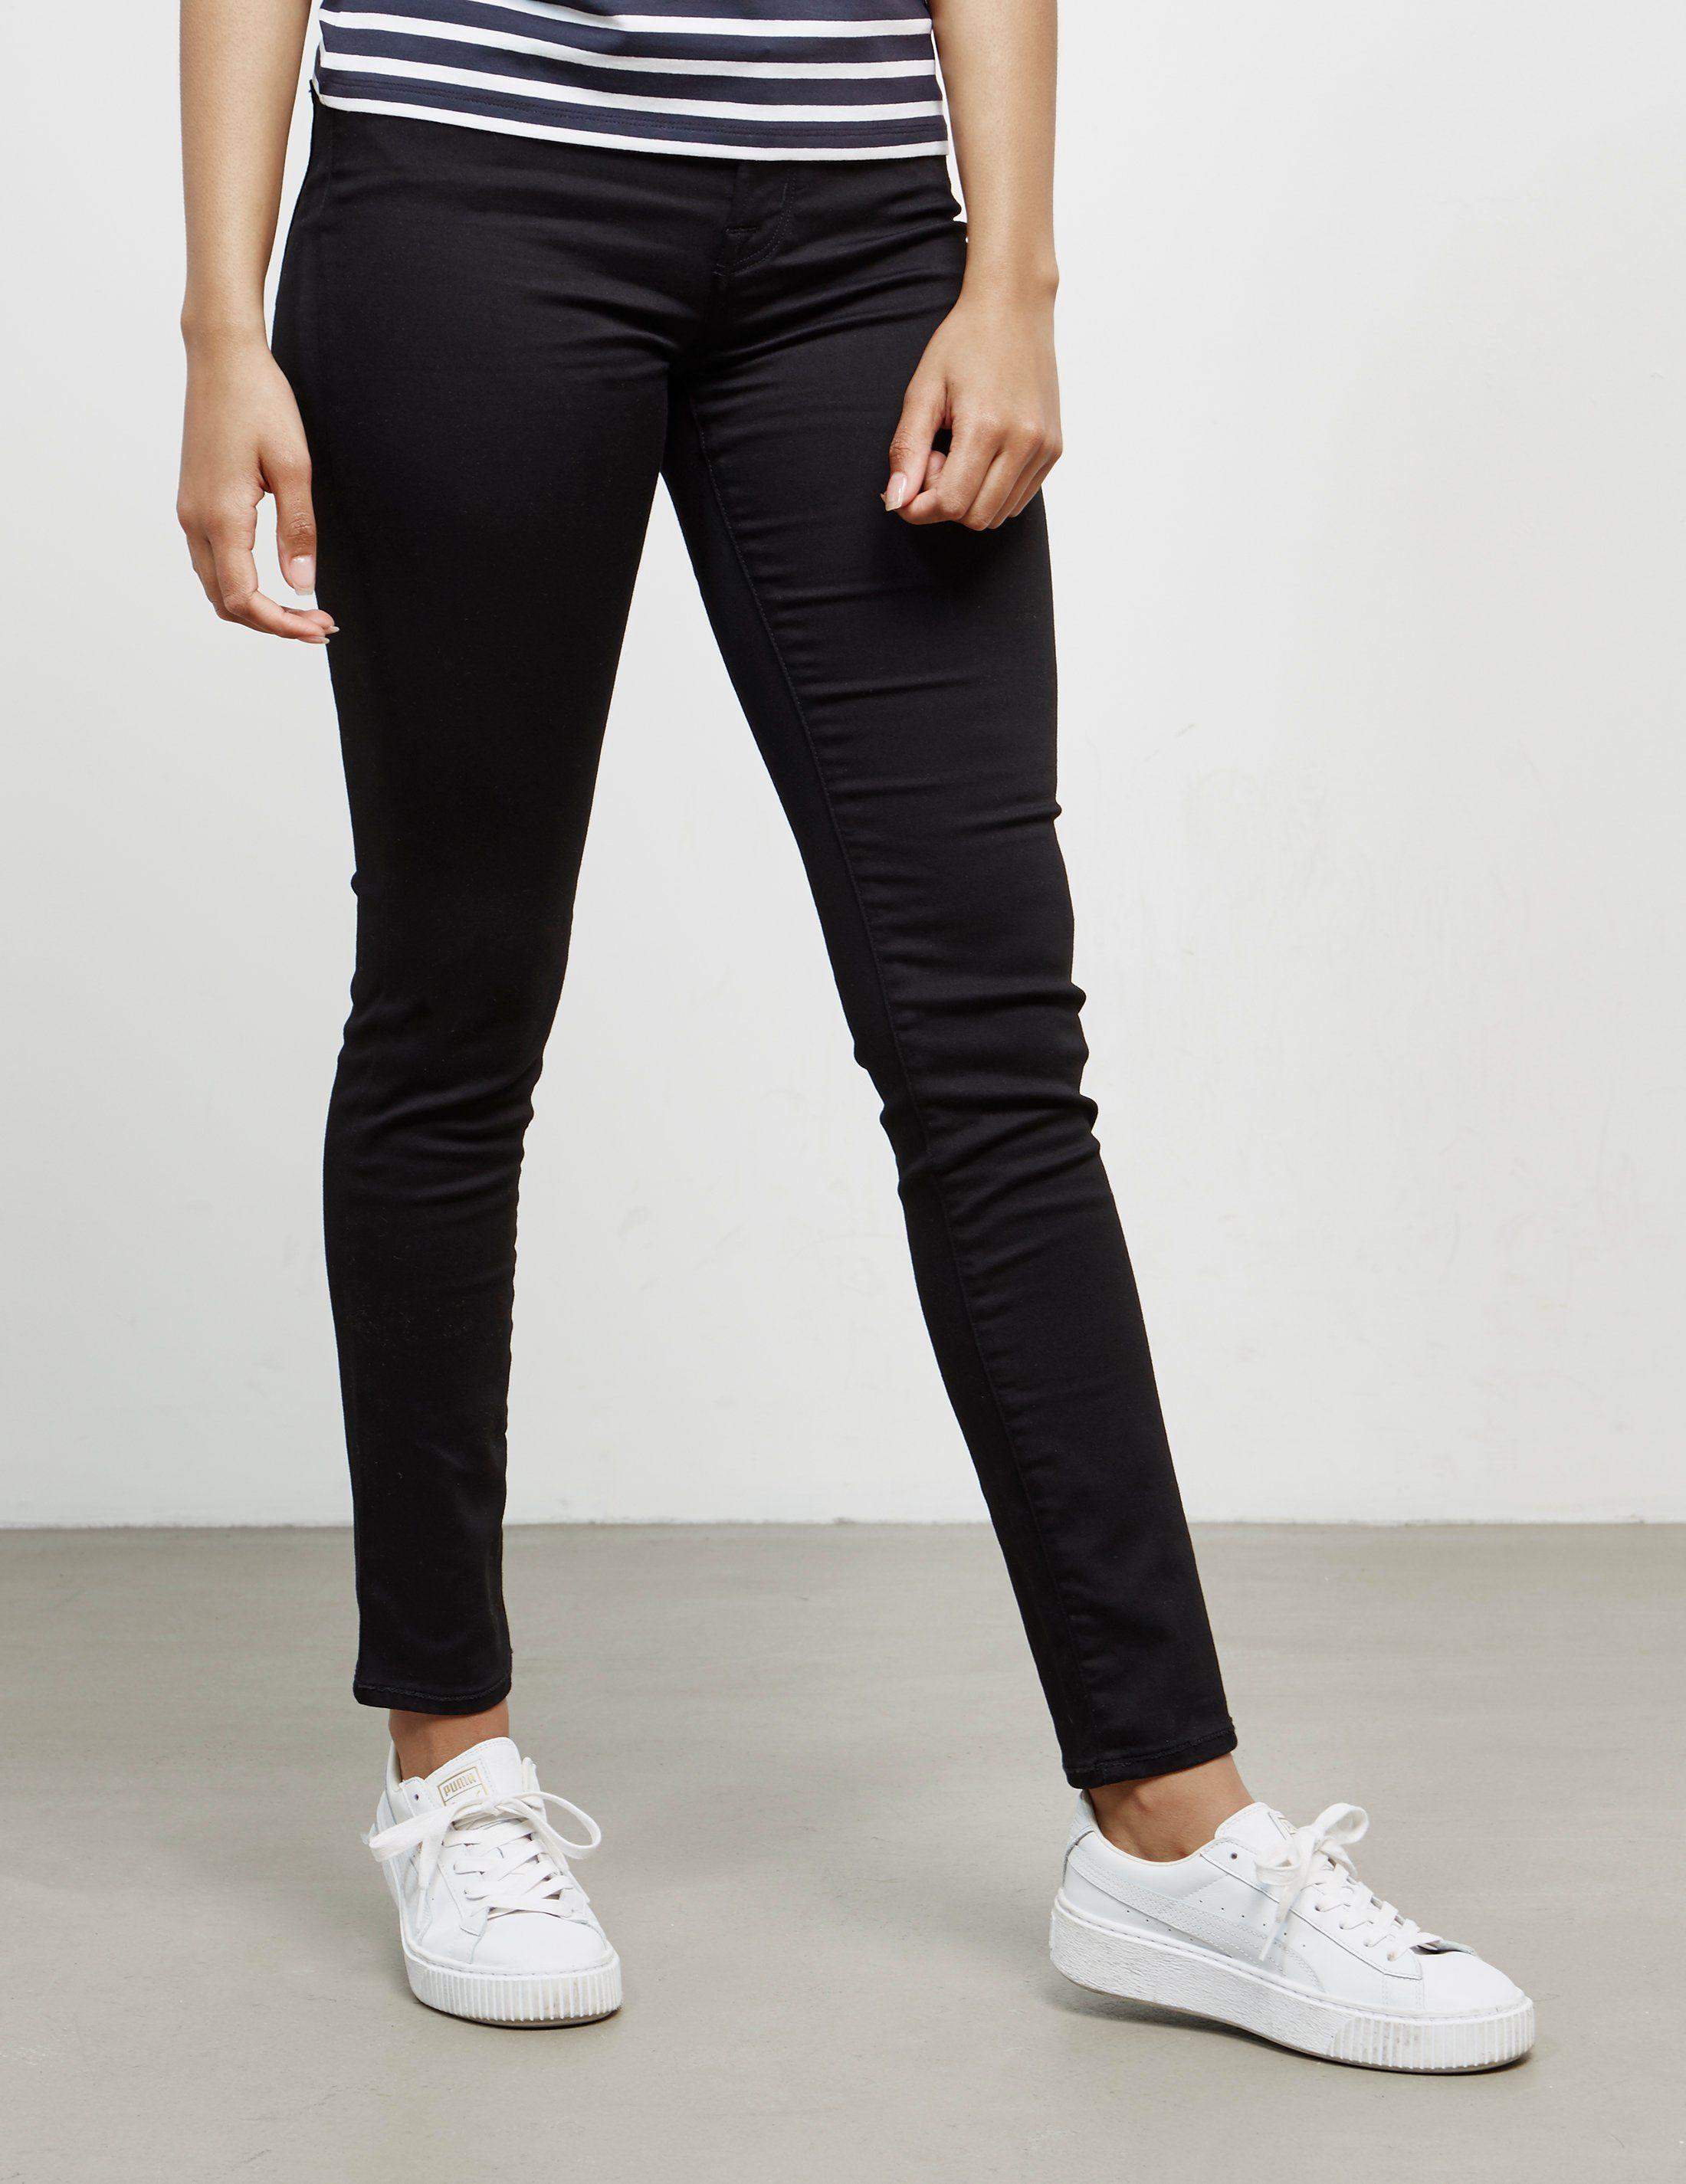 Jacob Cohen High Waisted Skinny Jeans